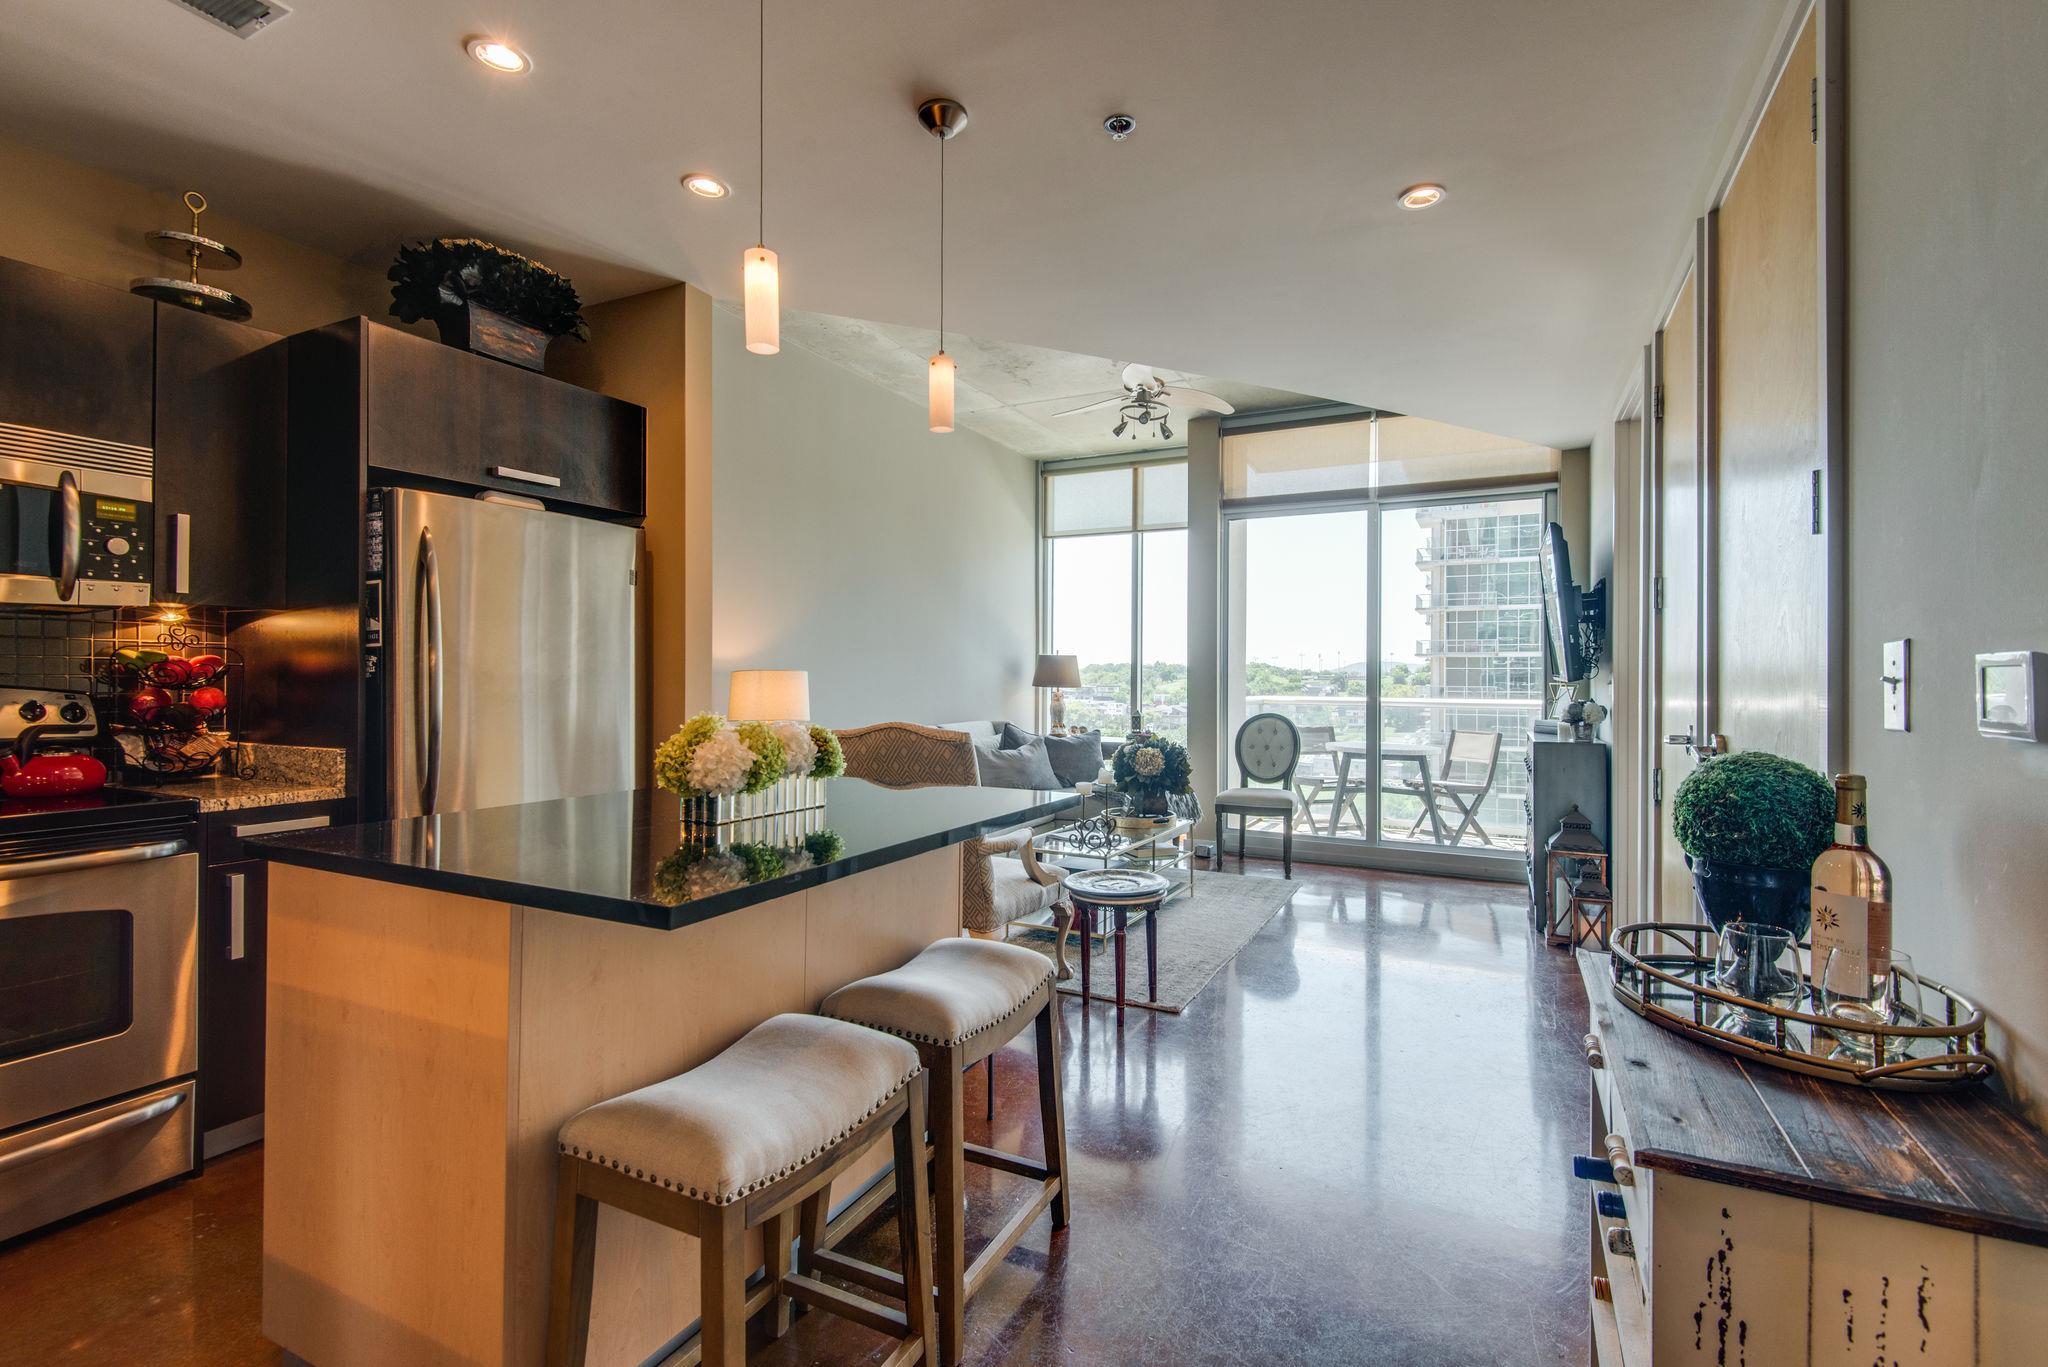 600 12th Avenue S, #1512, Nashville, TN 37203 - Nashville, TN real estate listing